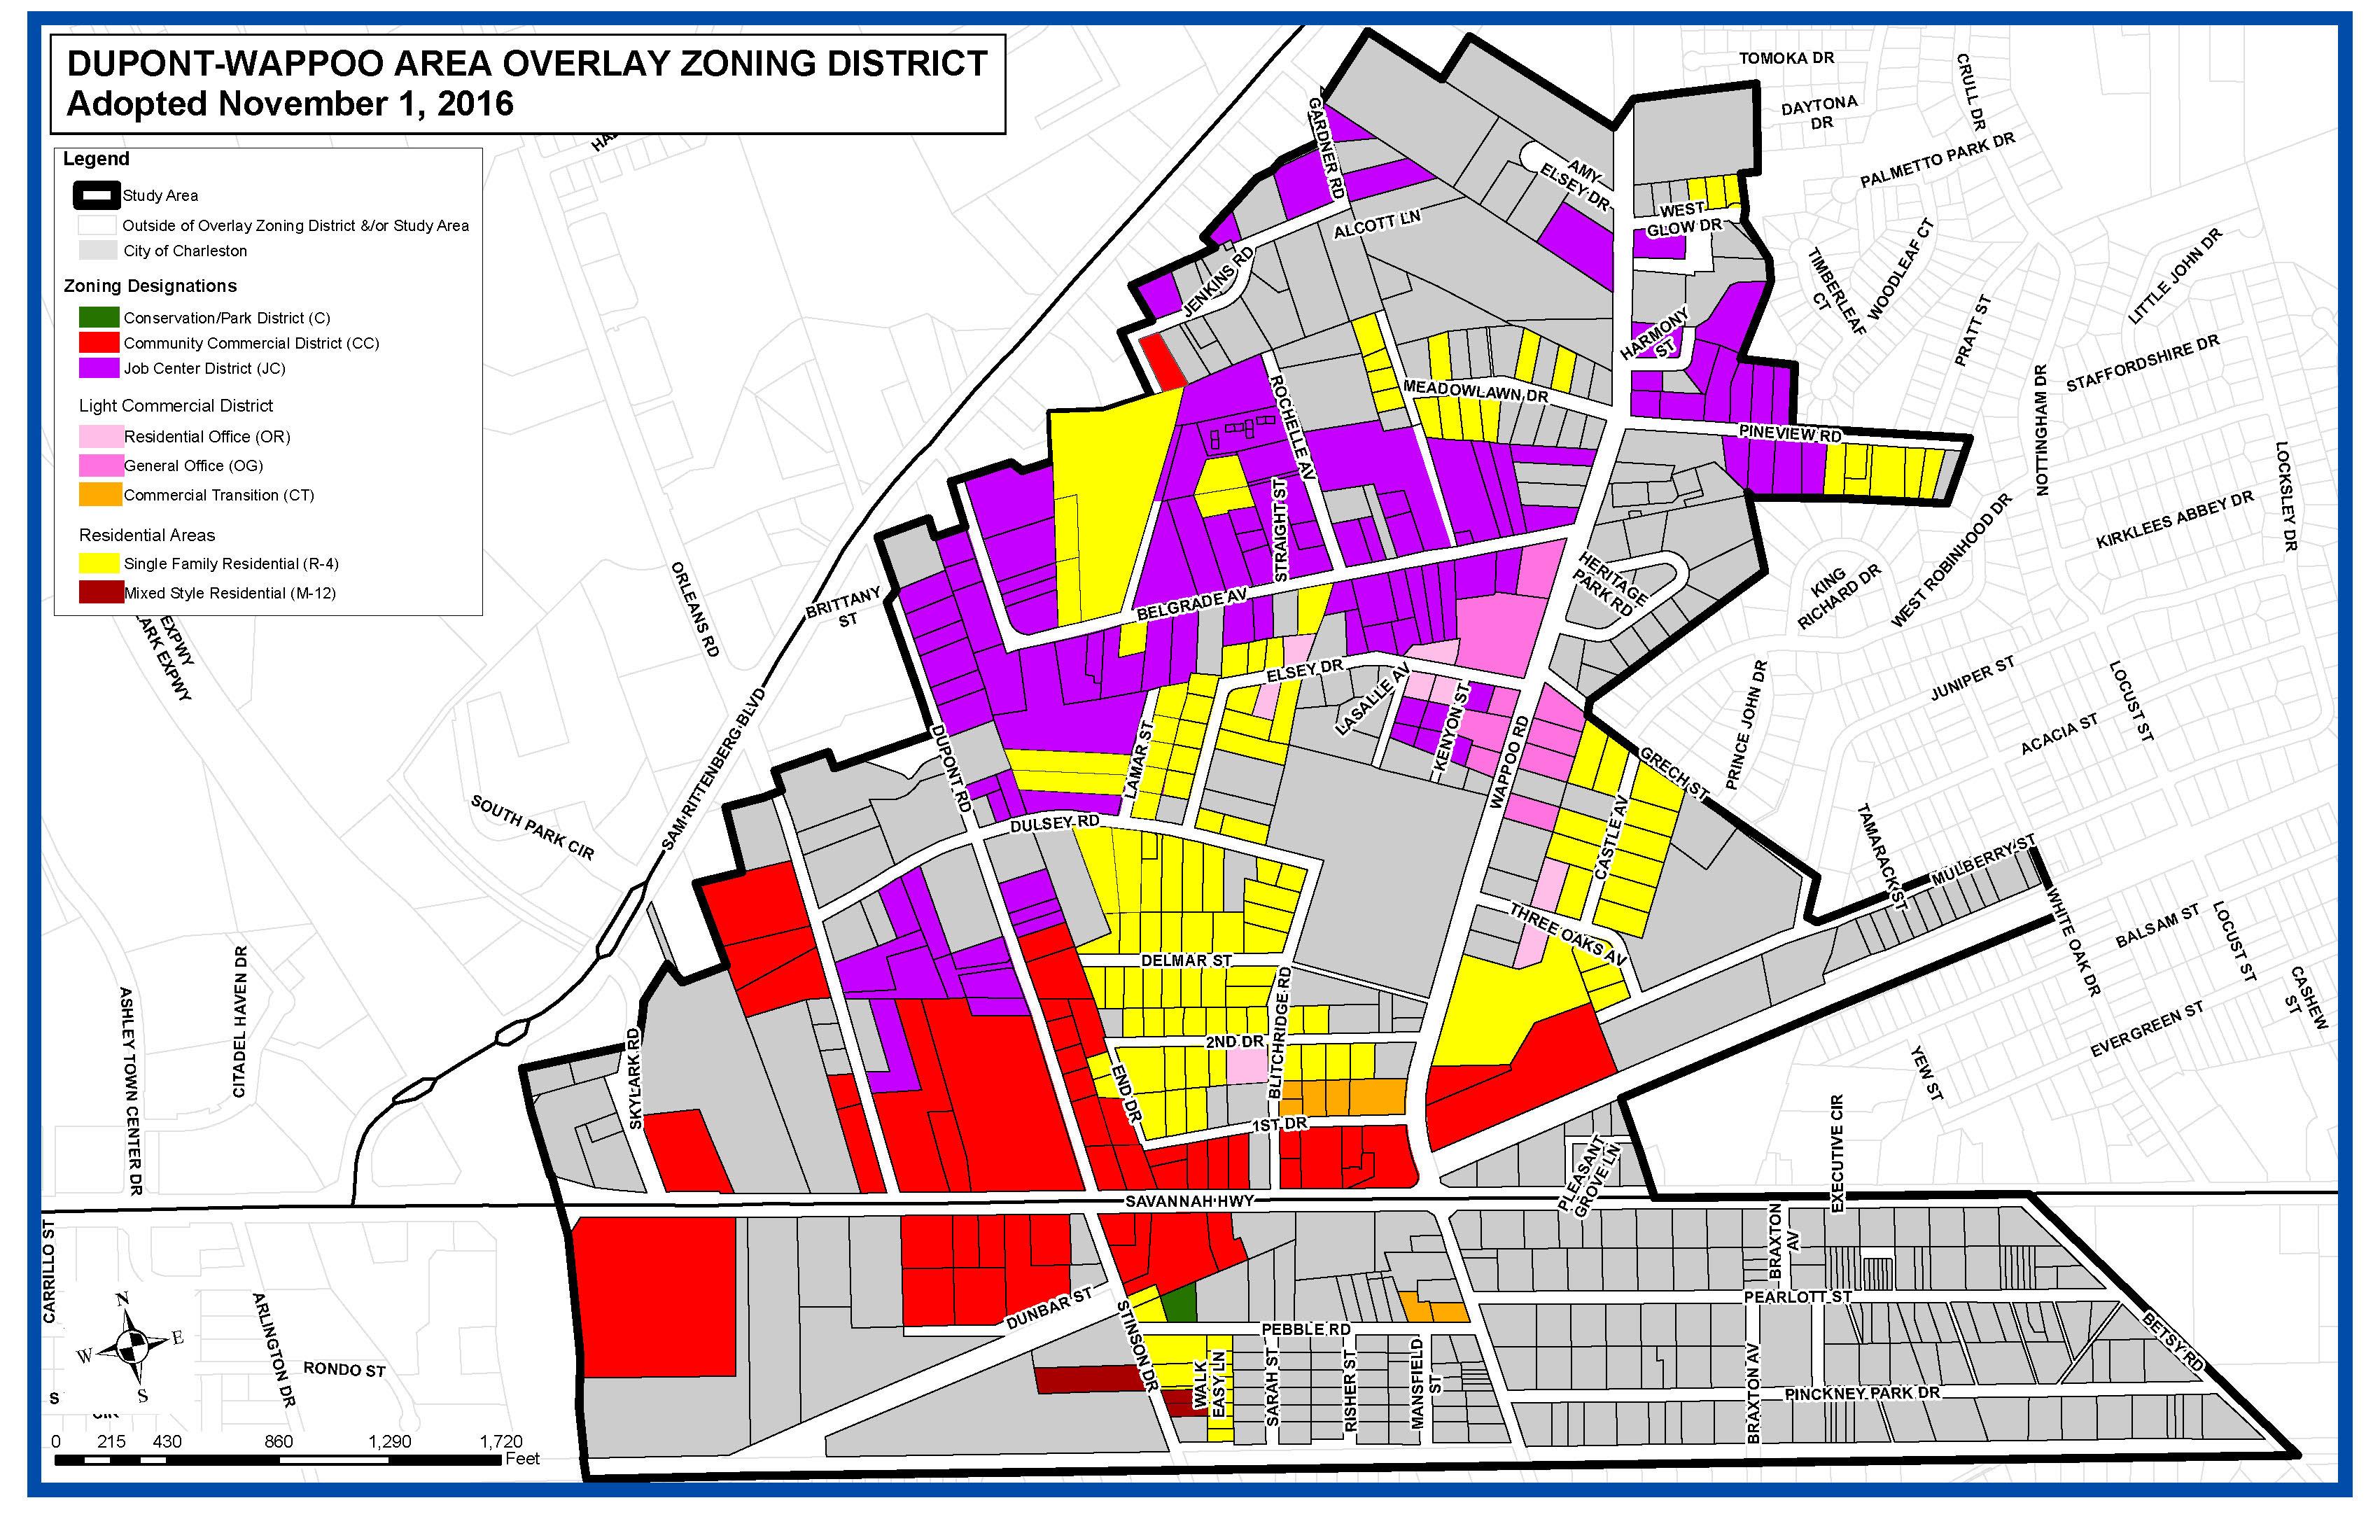 Zoning and Land Development Regulations - Document Viewer